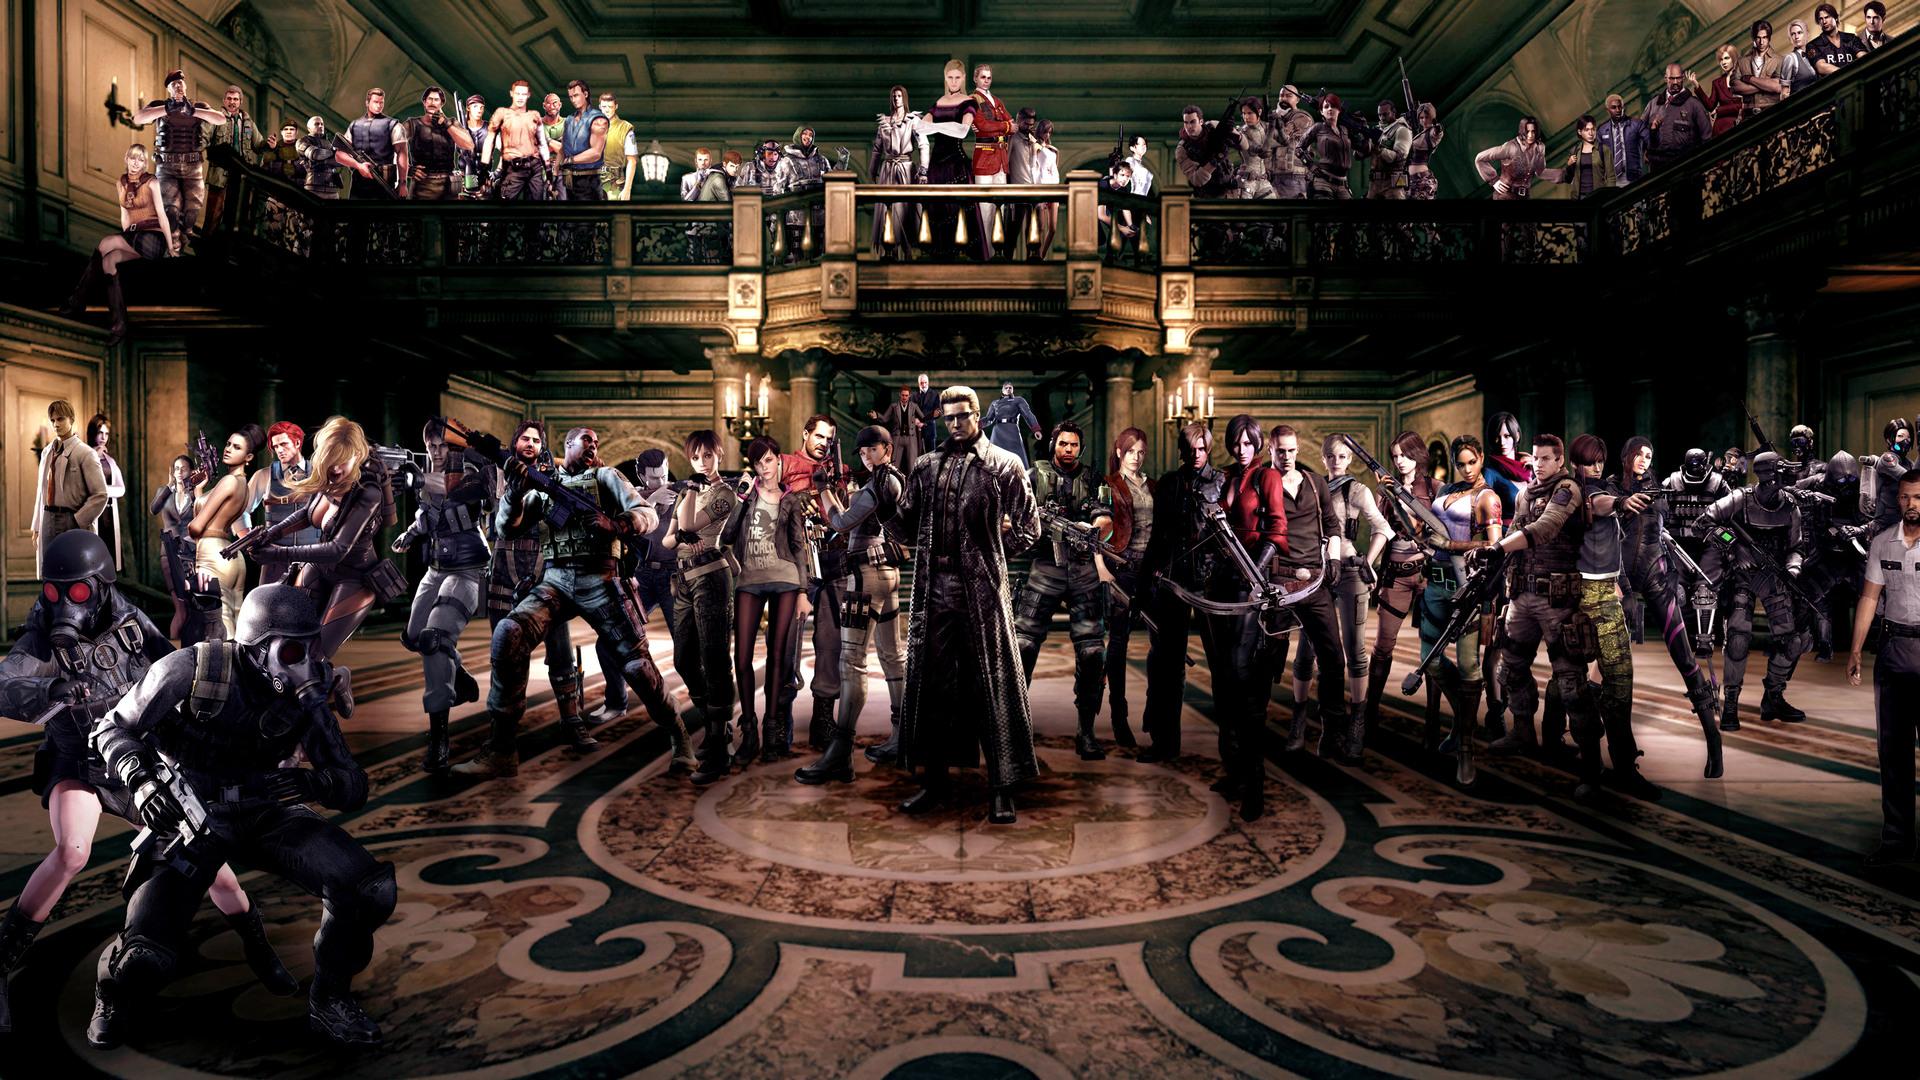 1920x1080 Resident Evil Characters Laptop Full Hd 1080p Hd 4k